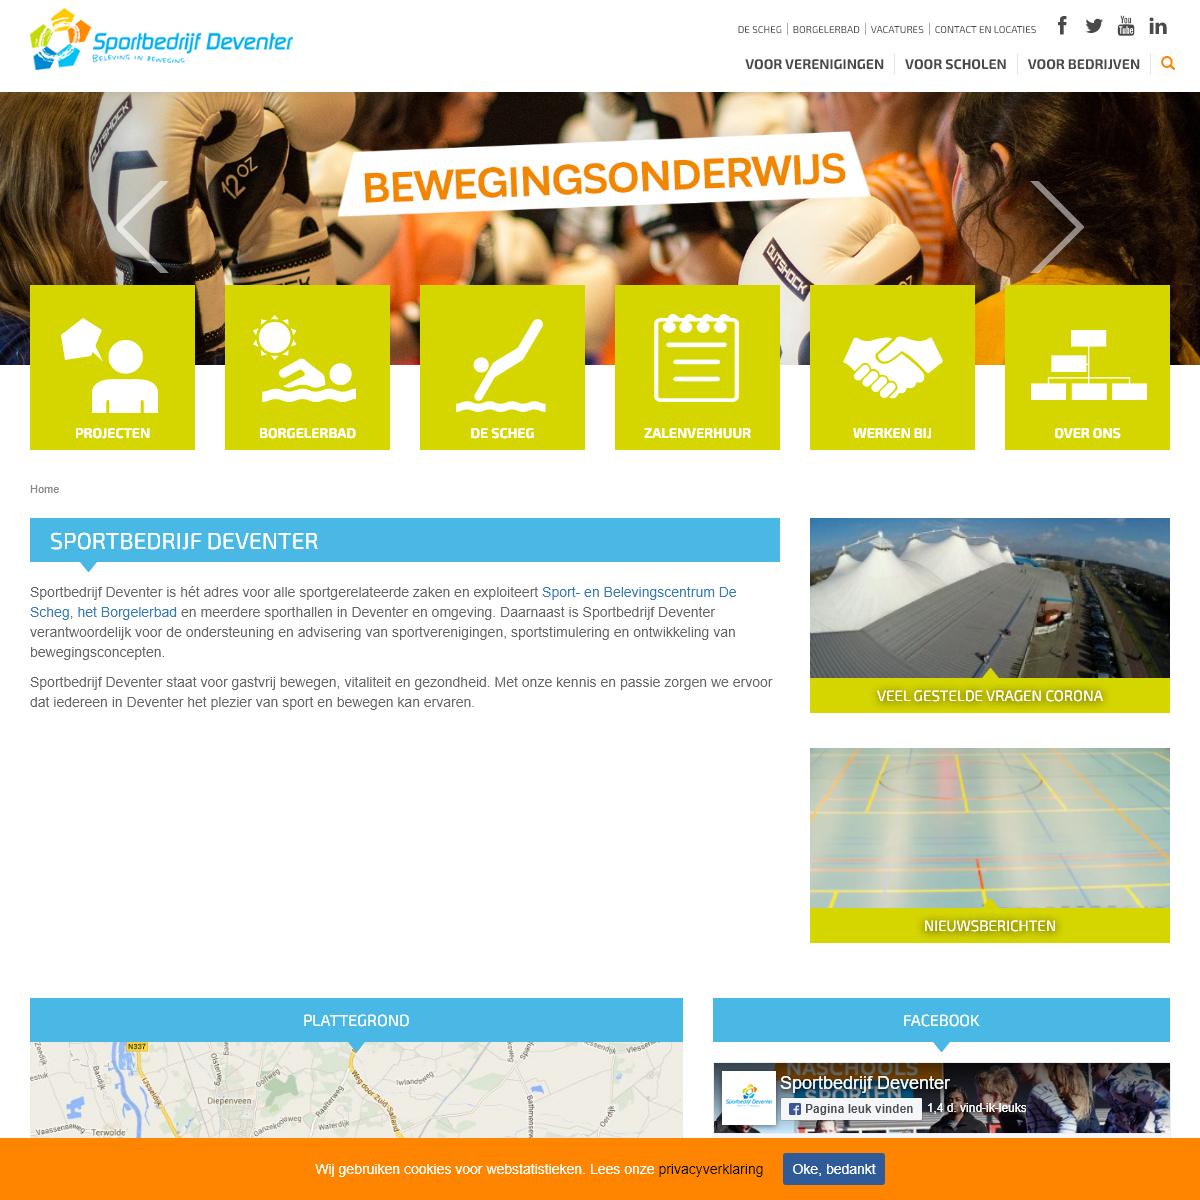 Sportbedrijf Deventer - Sportbedrijf Deventer